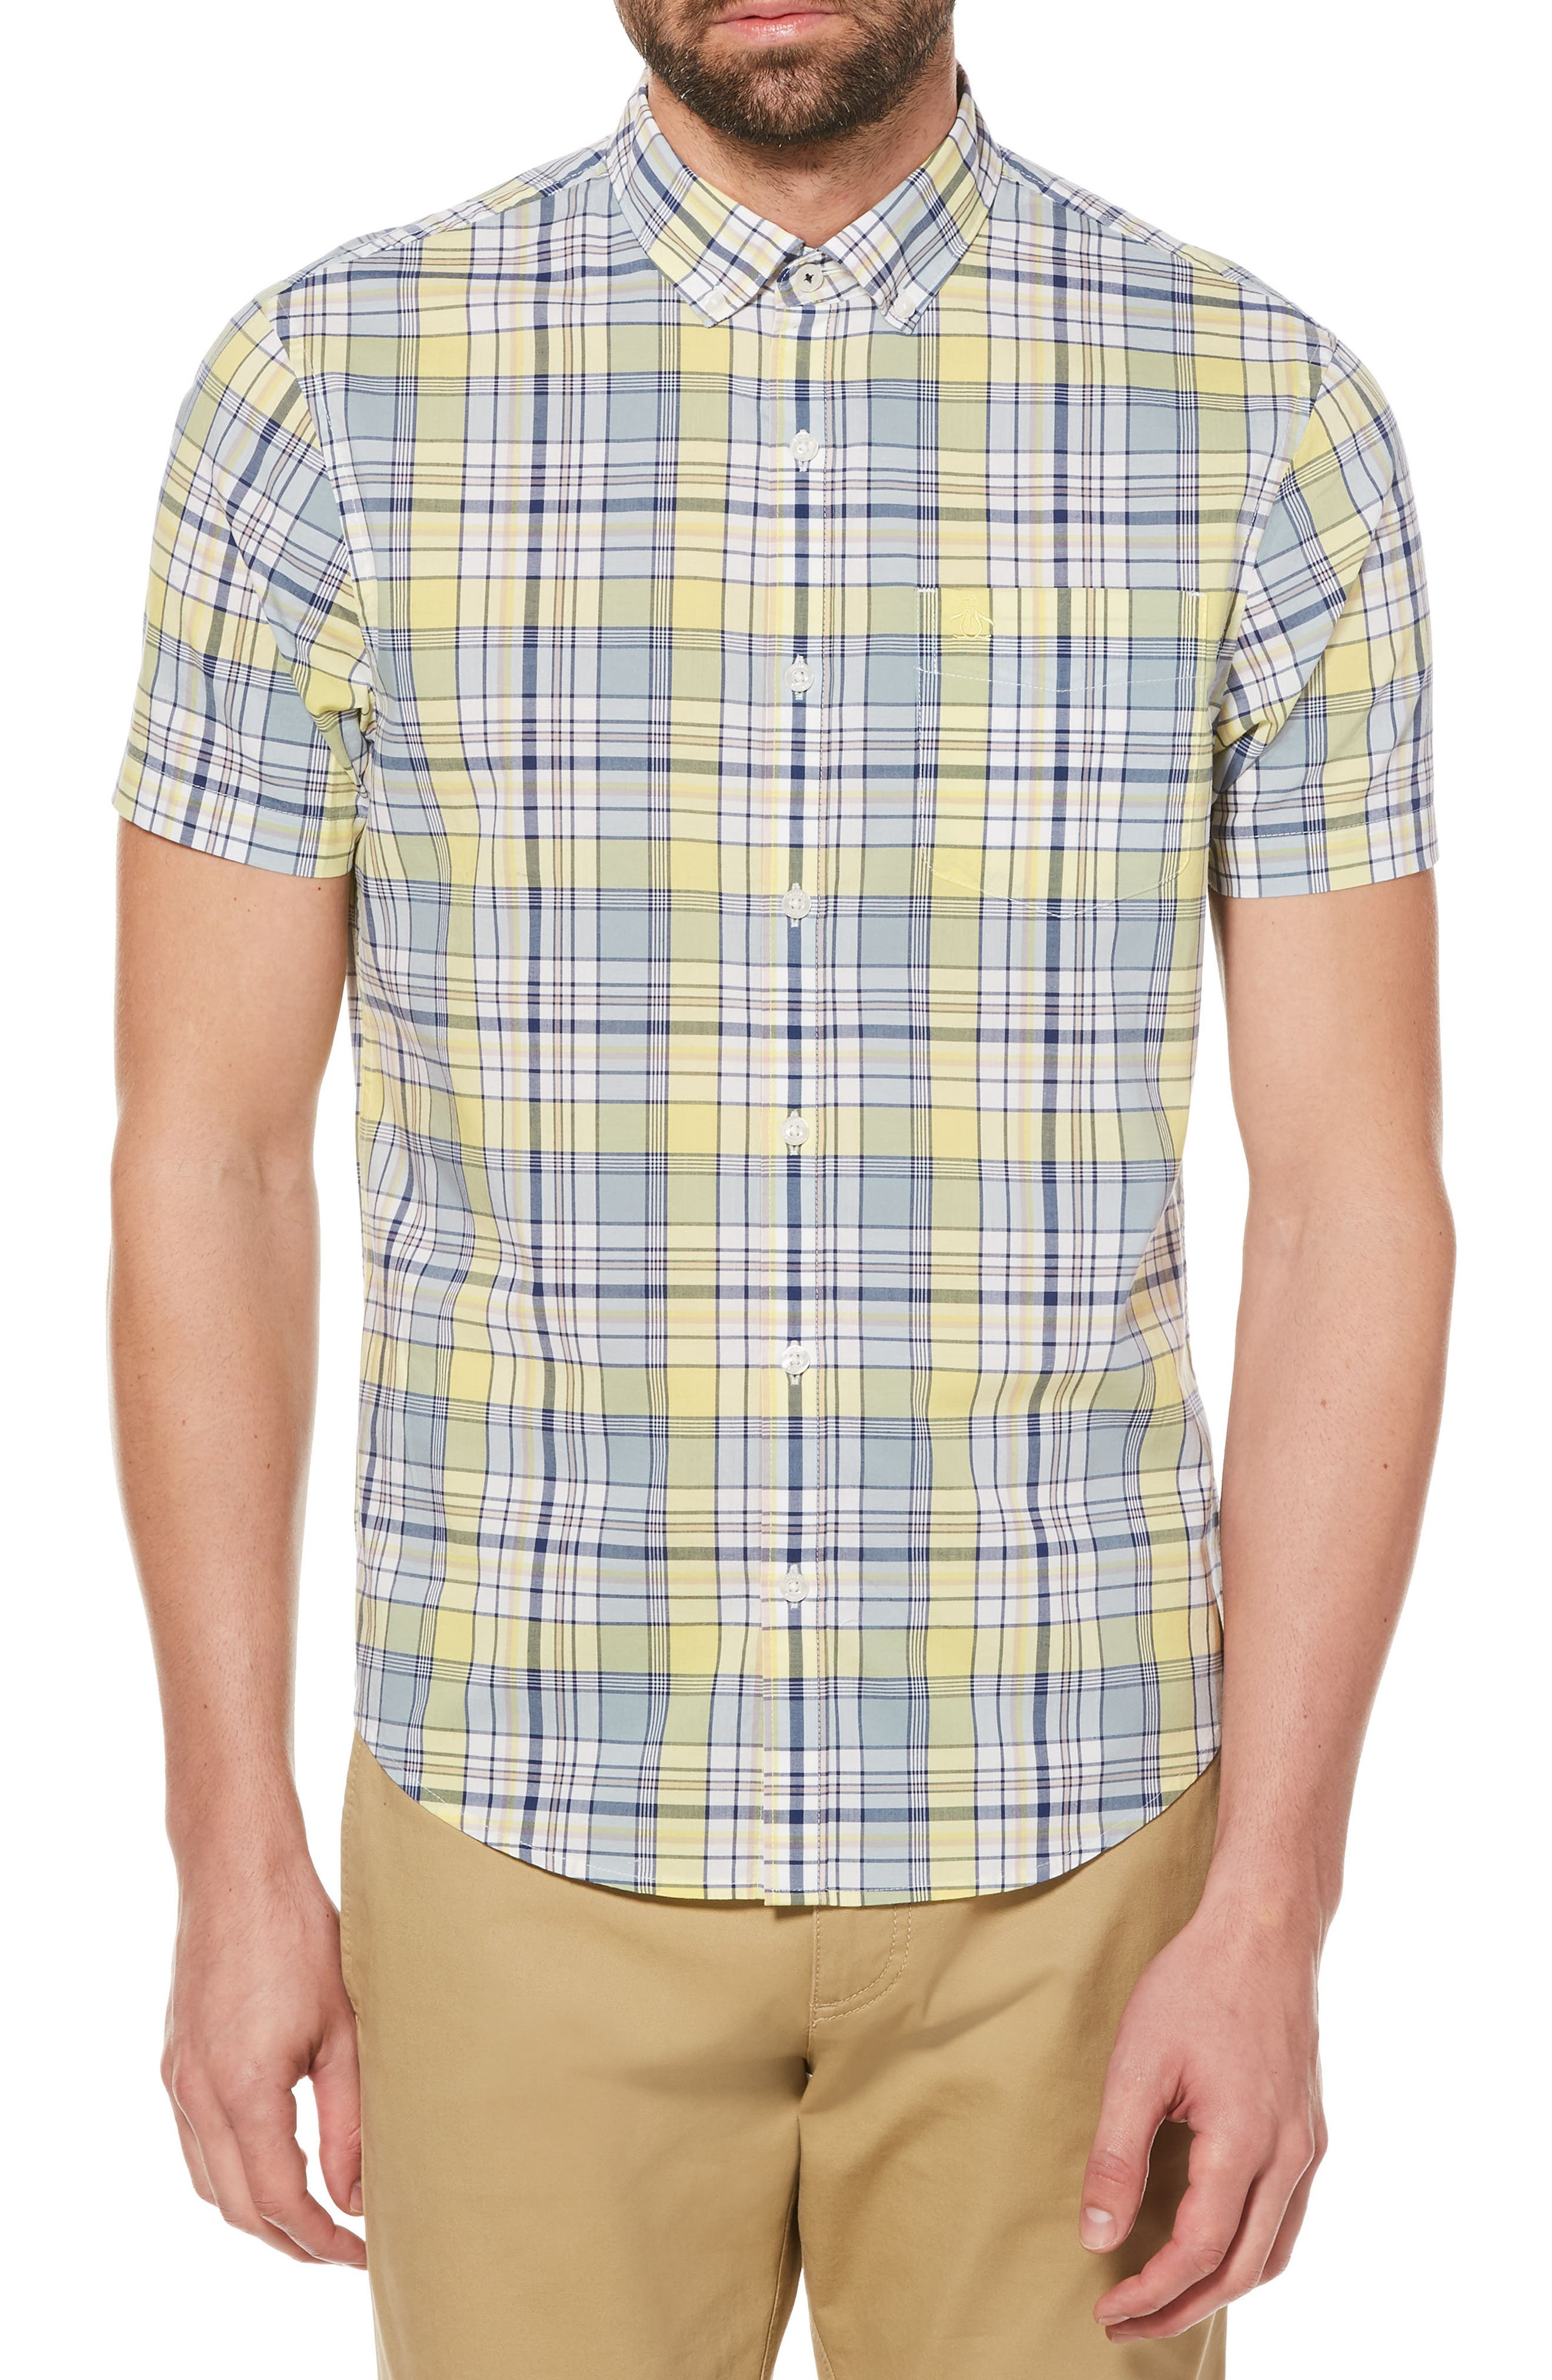 P55 Woven Shirt,                         Main,                         color, 751